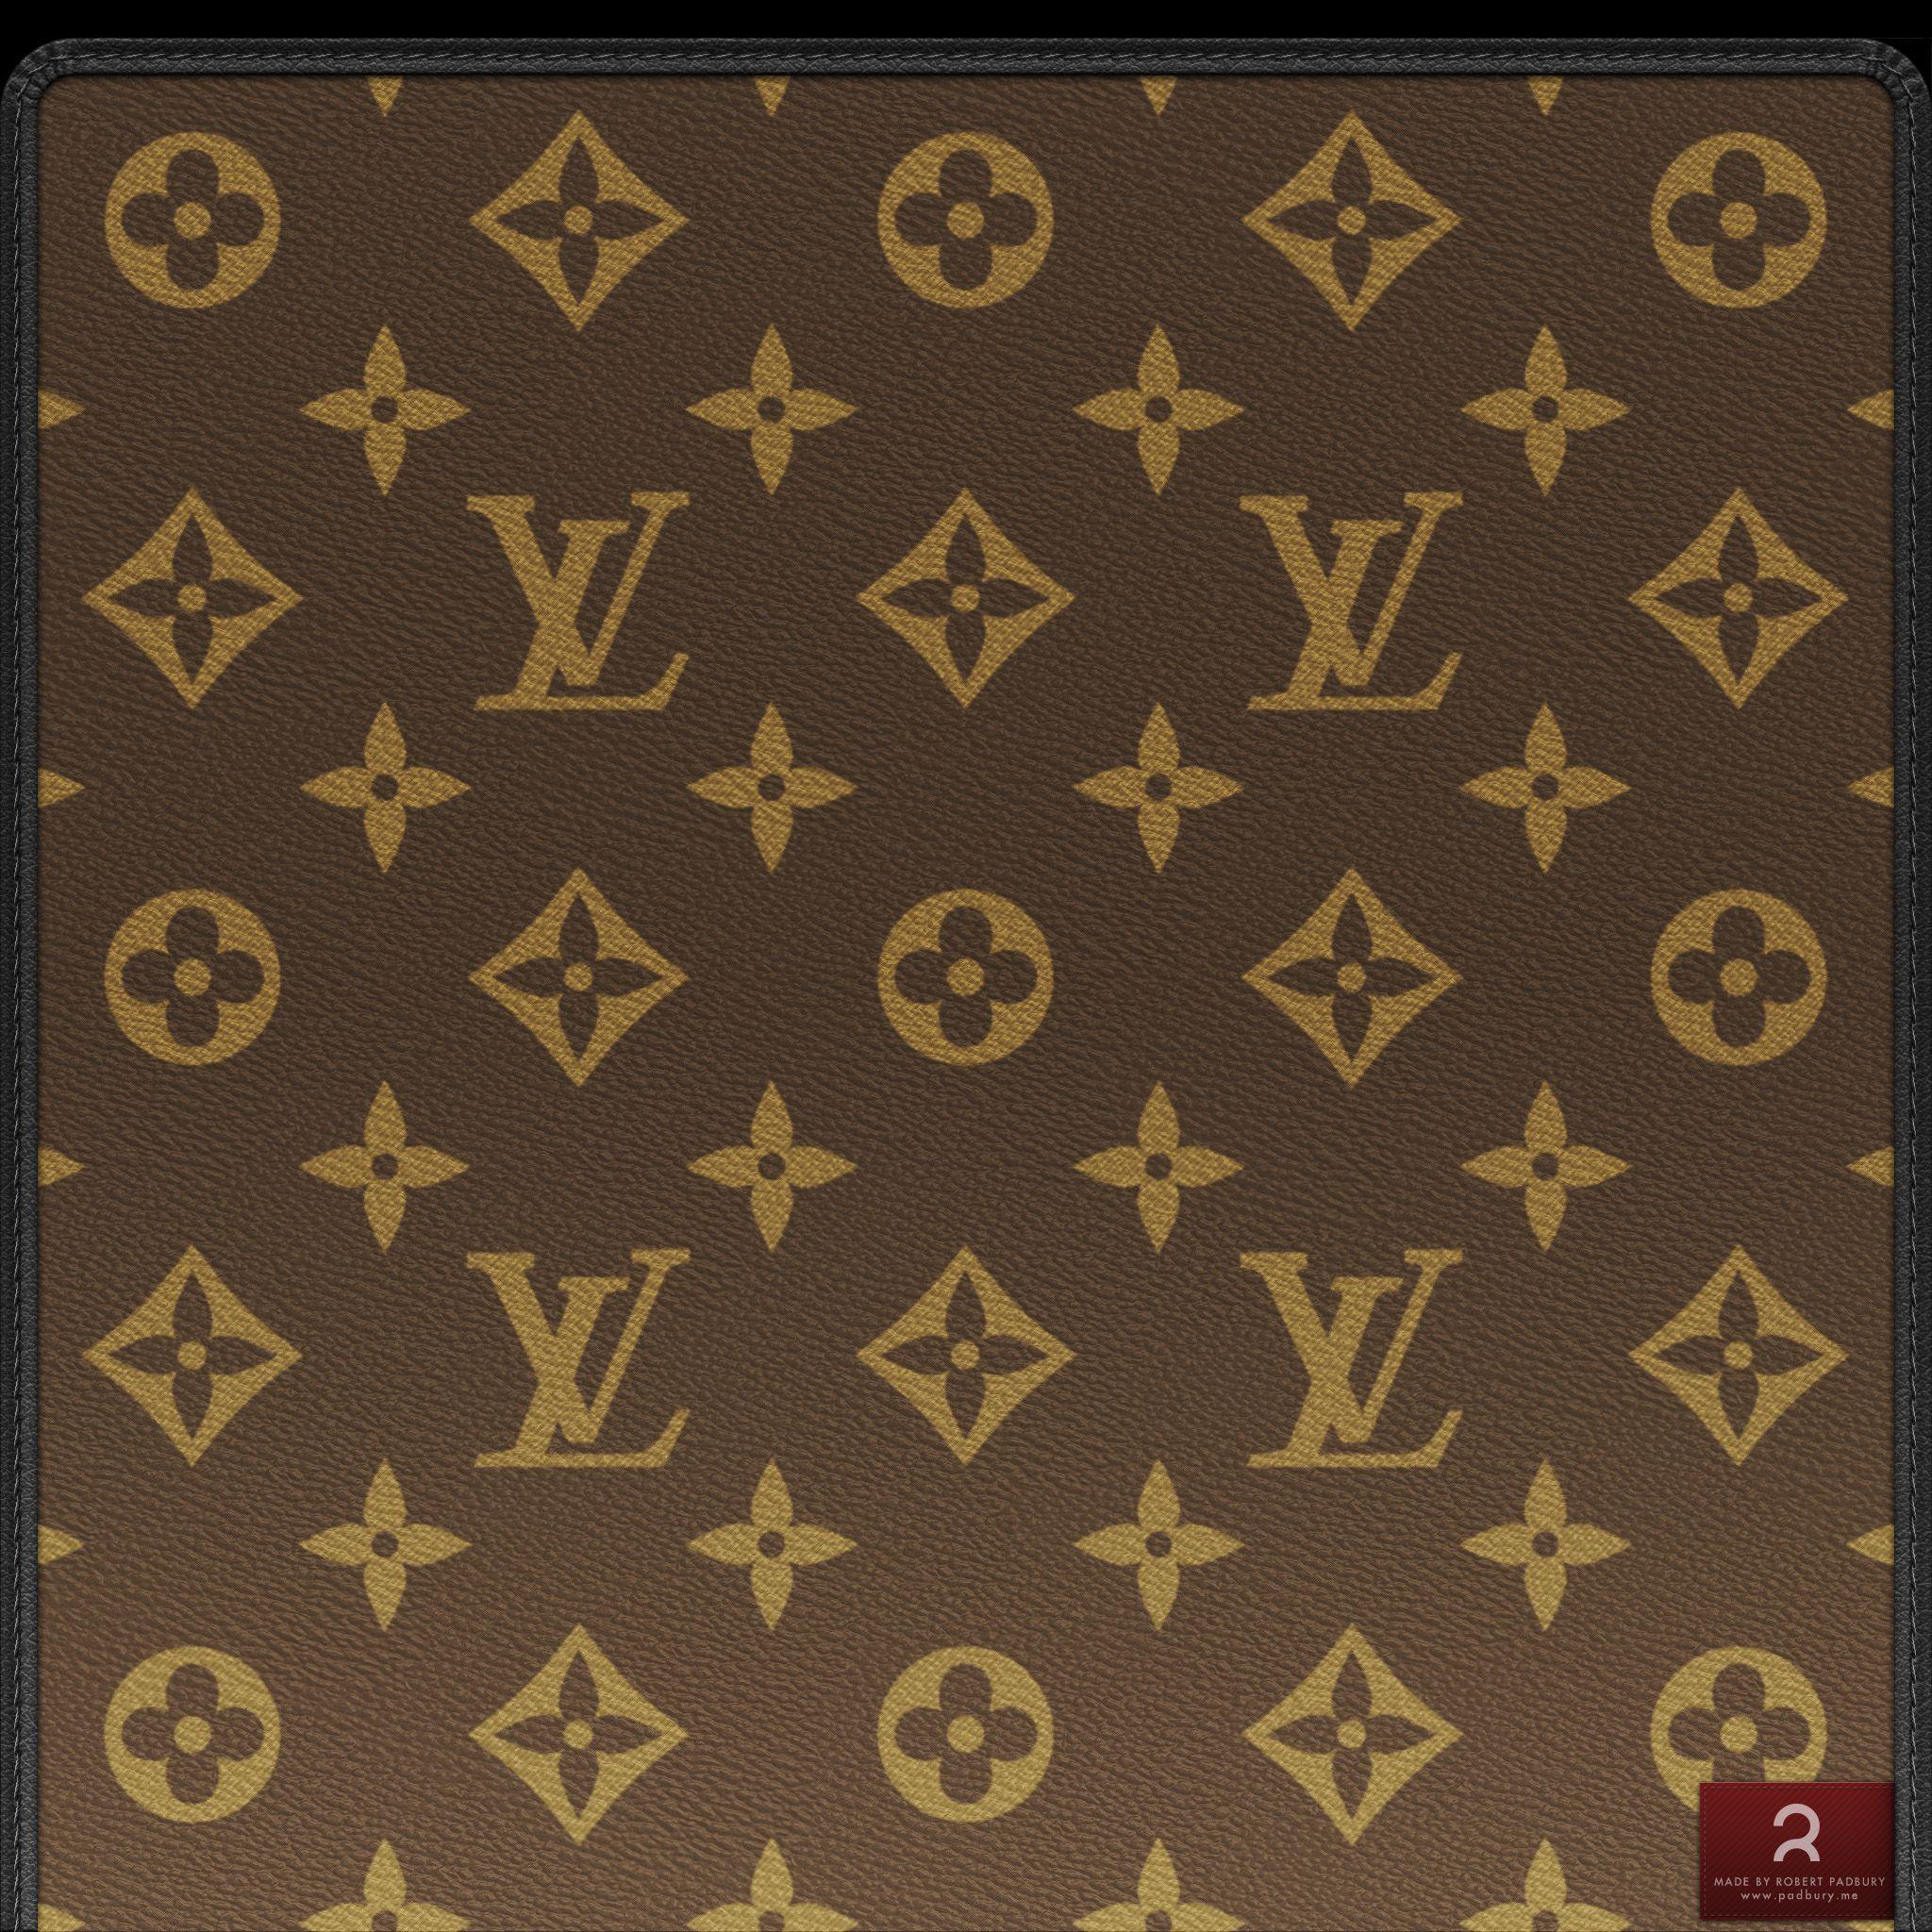 08d8e3d24e2 Louis Vuitton Retina Display Wallpaper Collection by Robert Padbury .